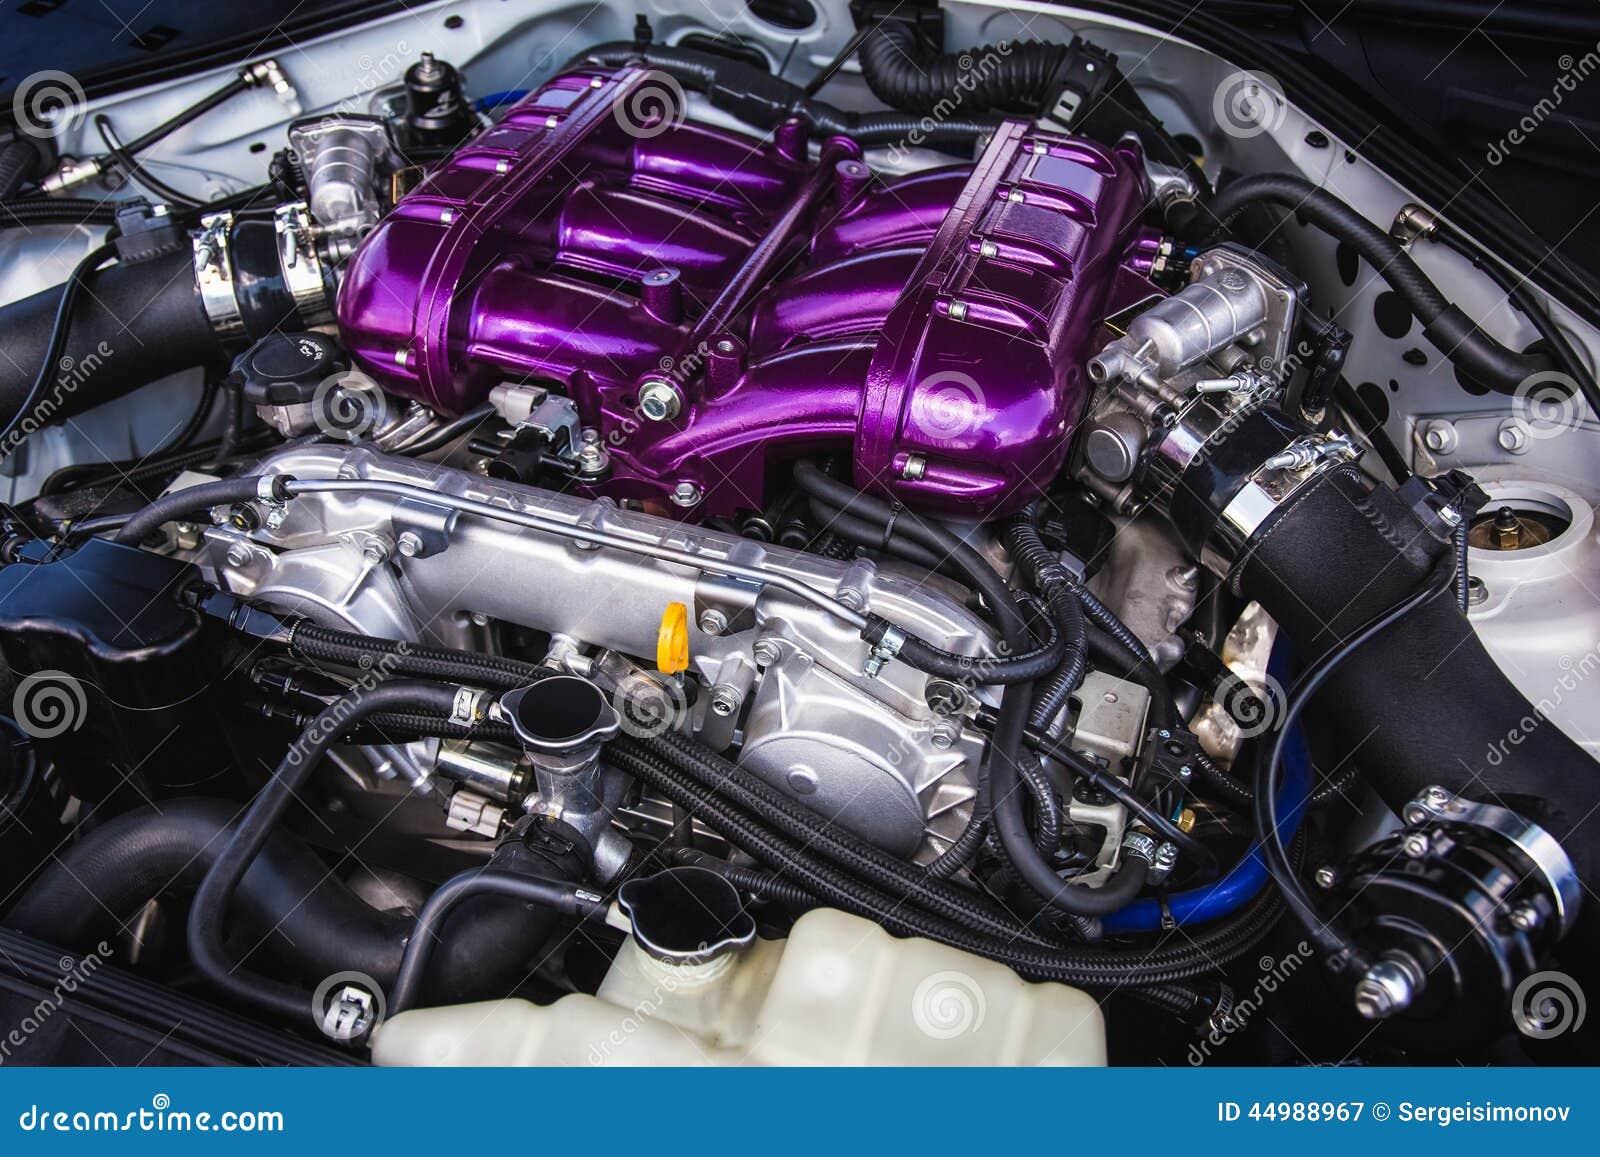 sport engine tech powerful camshafts hood